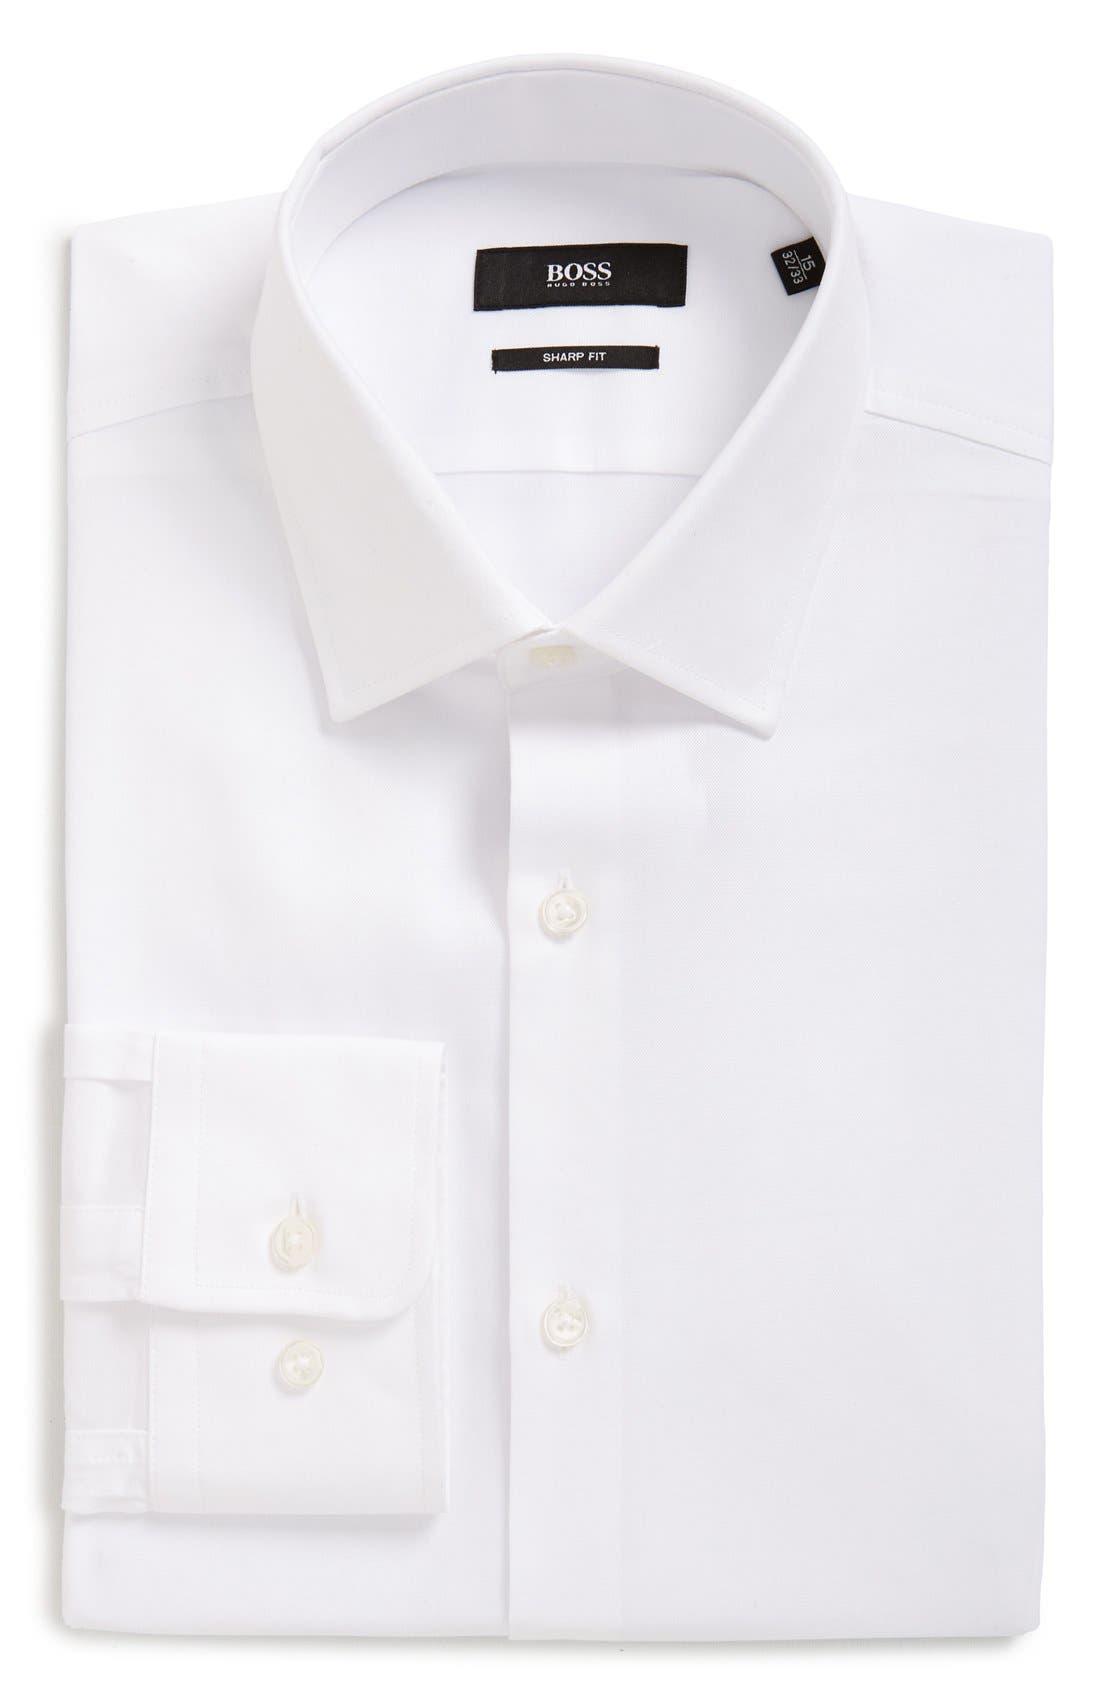 Main Image - BOSS Sharp Fit Solid Dress Shirt